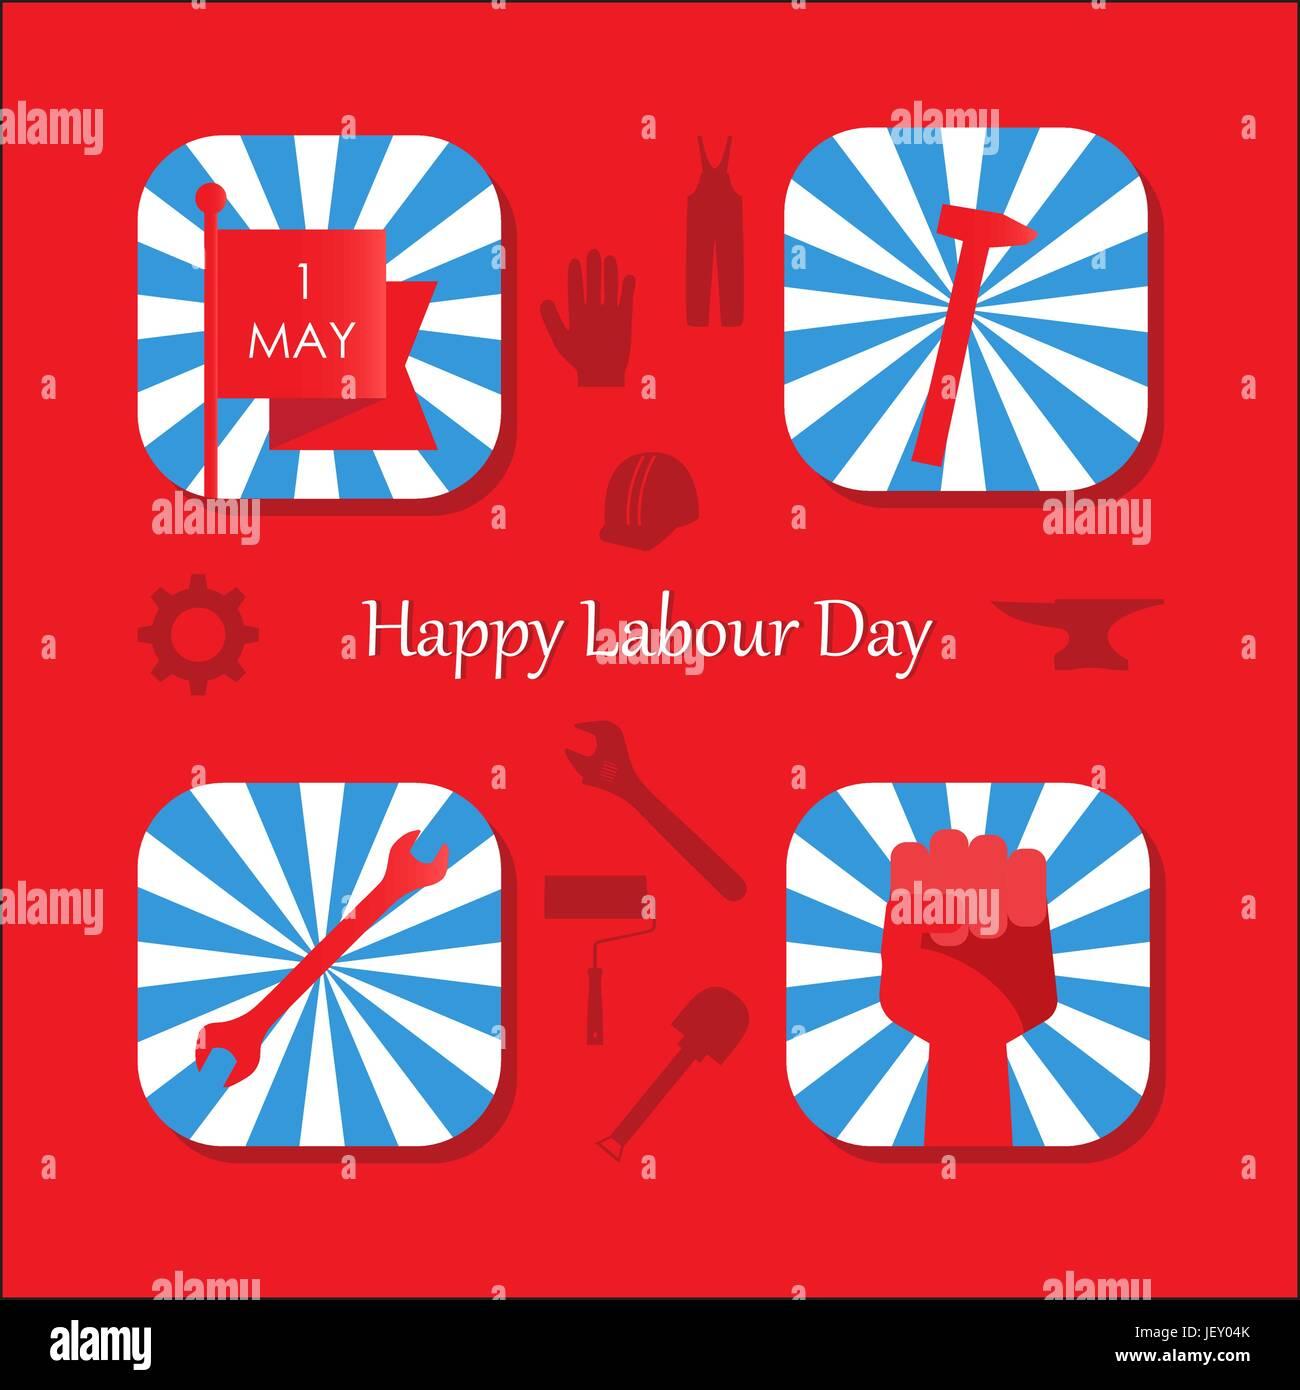 May 1 International Labor Day - Stock Vector